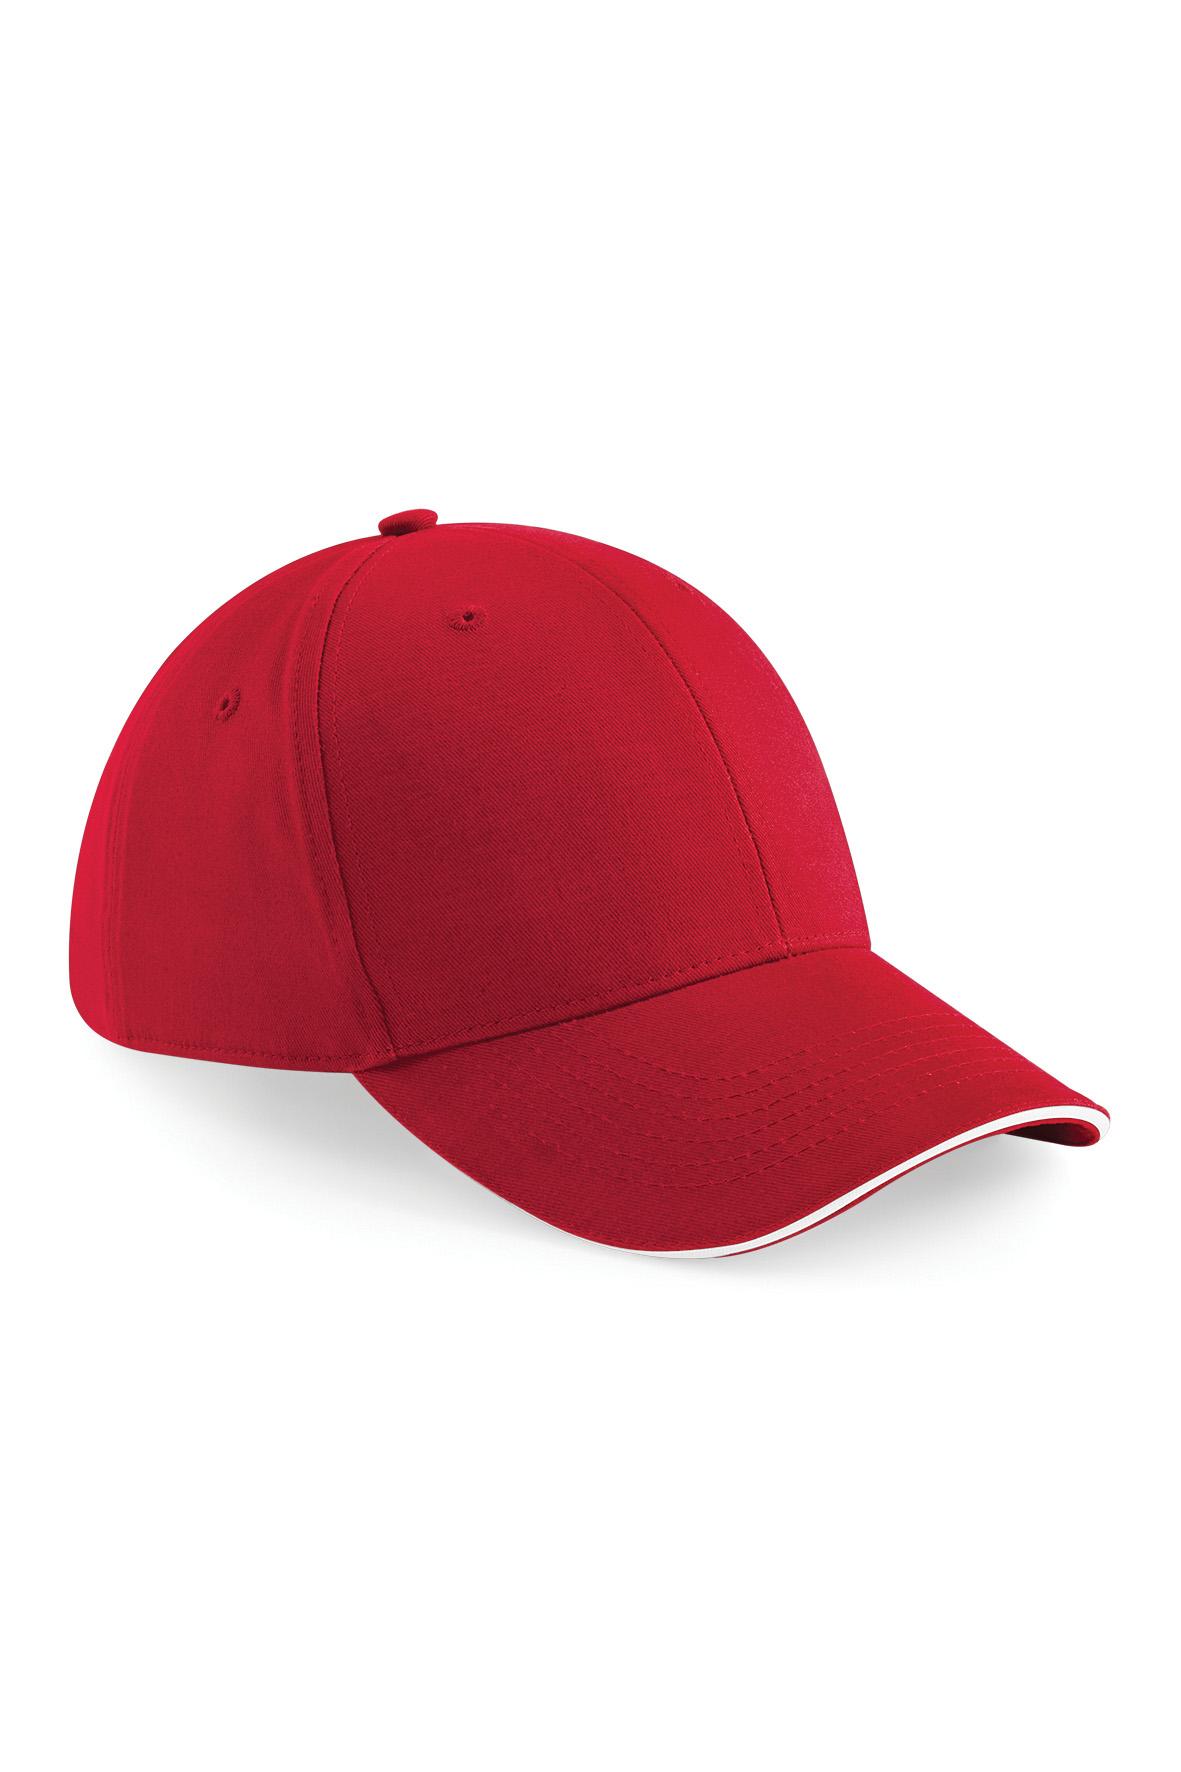 Athleisure Lippis Classic Red - Valkoinen